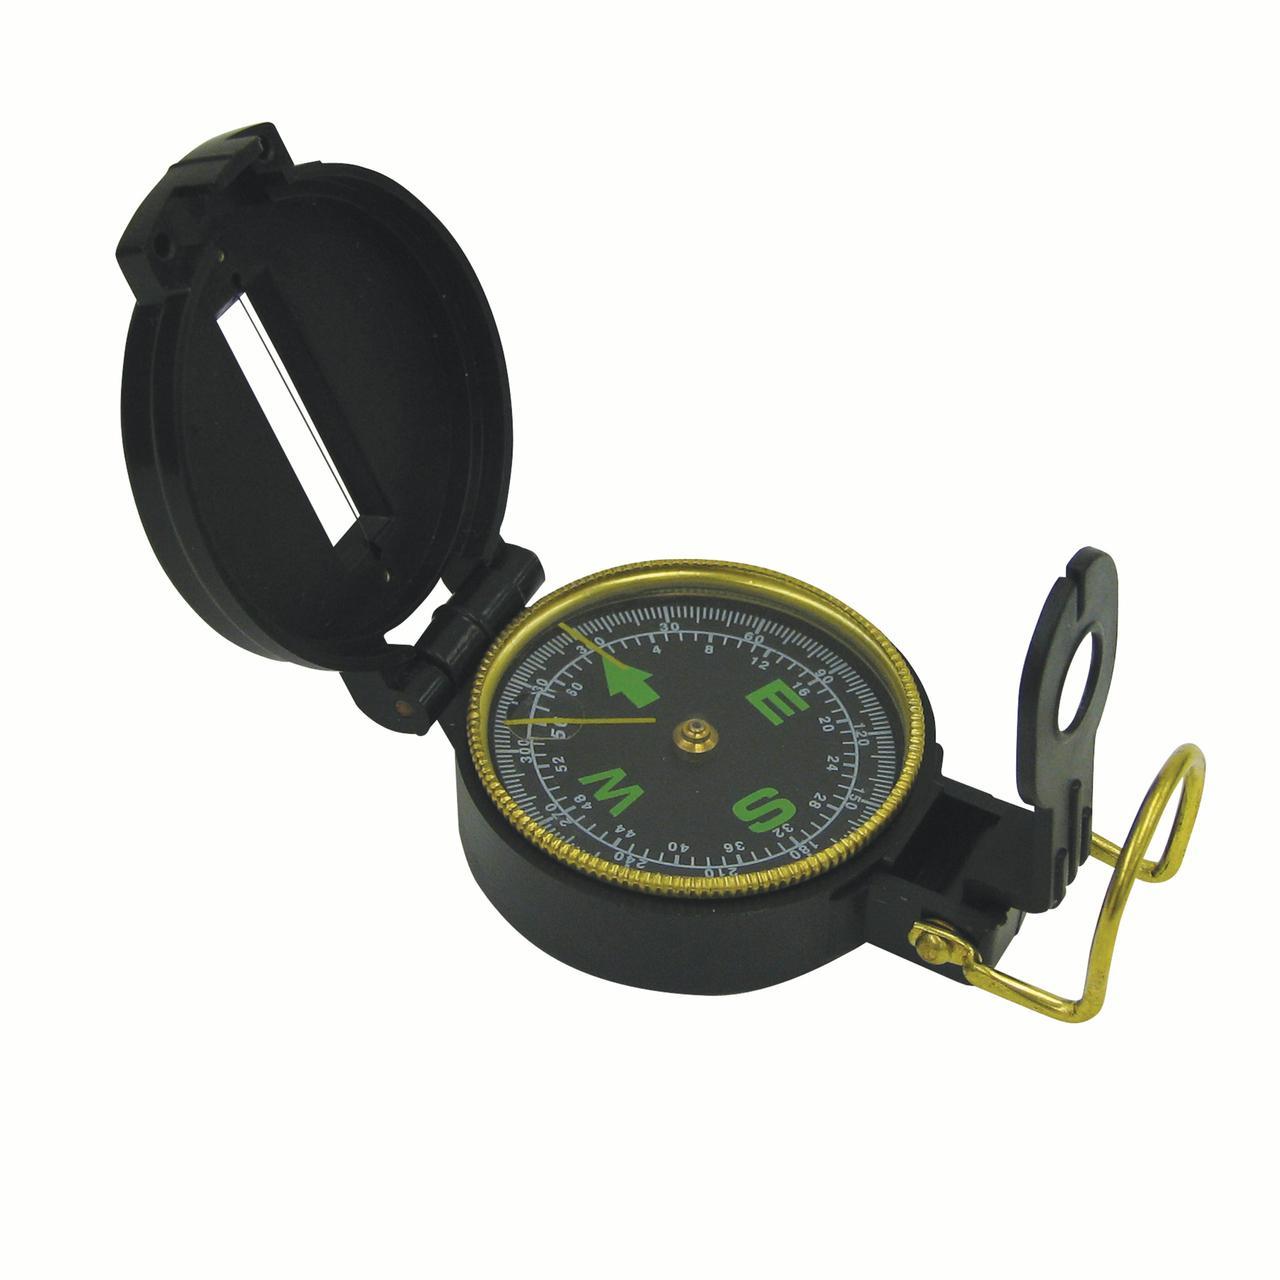 Stansport Lensatic Compass - Plastic